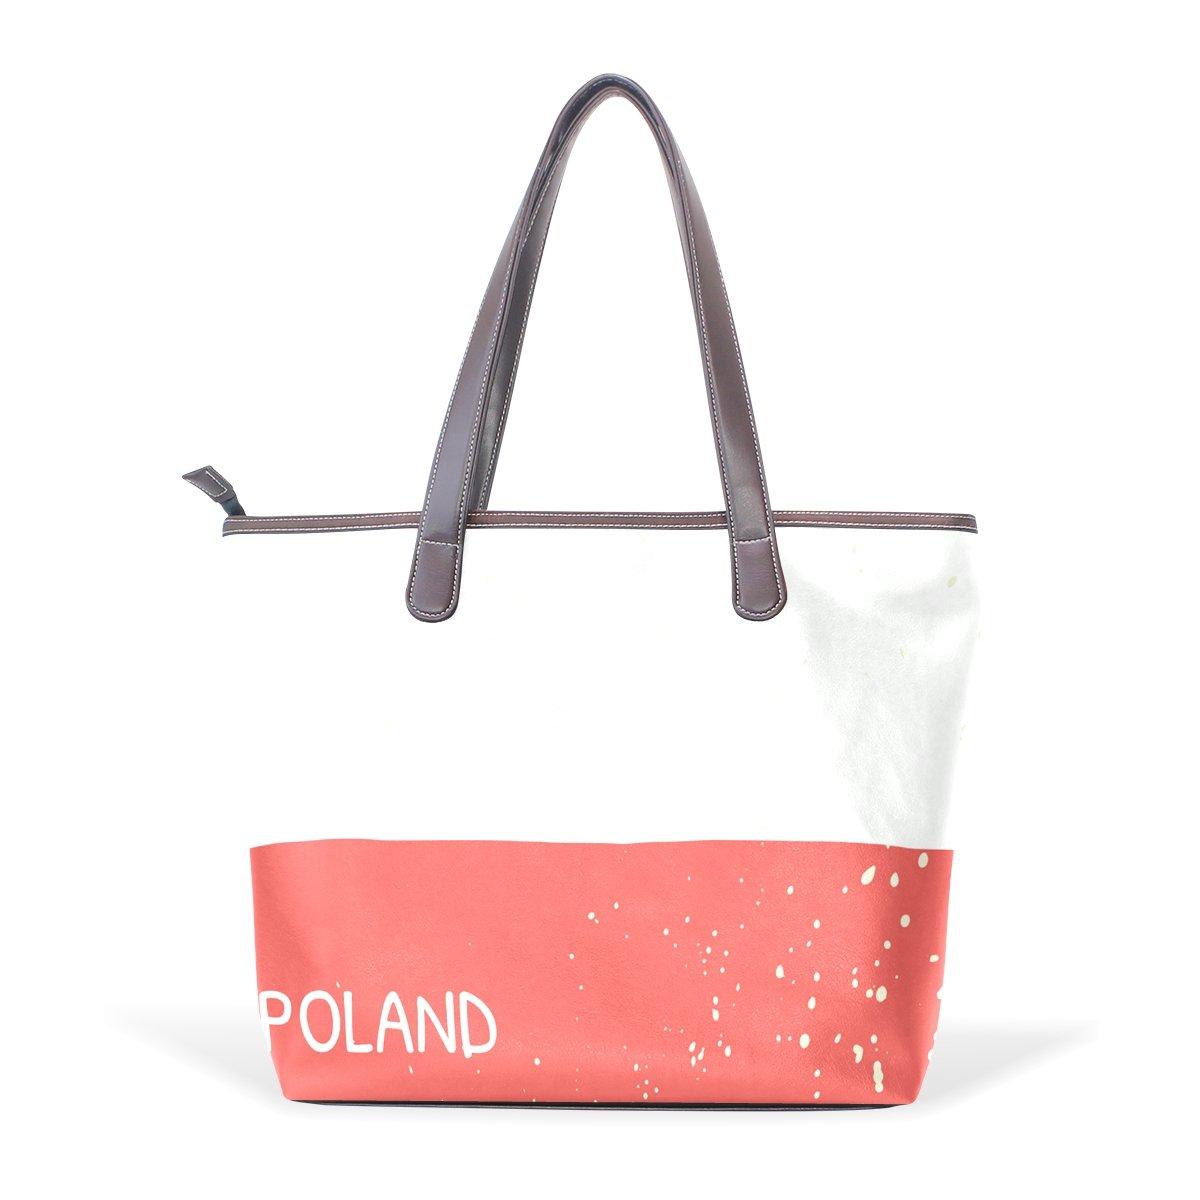 Distressed Poland Flag Womens Fashion Large Shoulder Bag Handbag Tote Purse for Lady